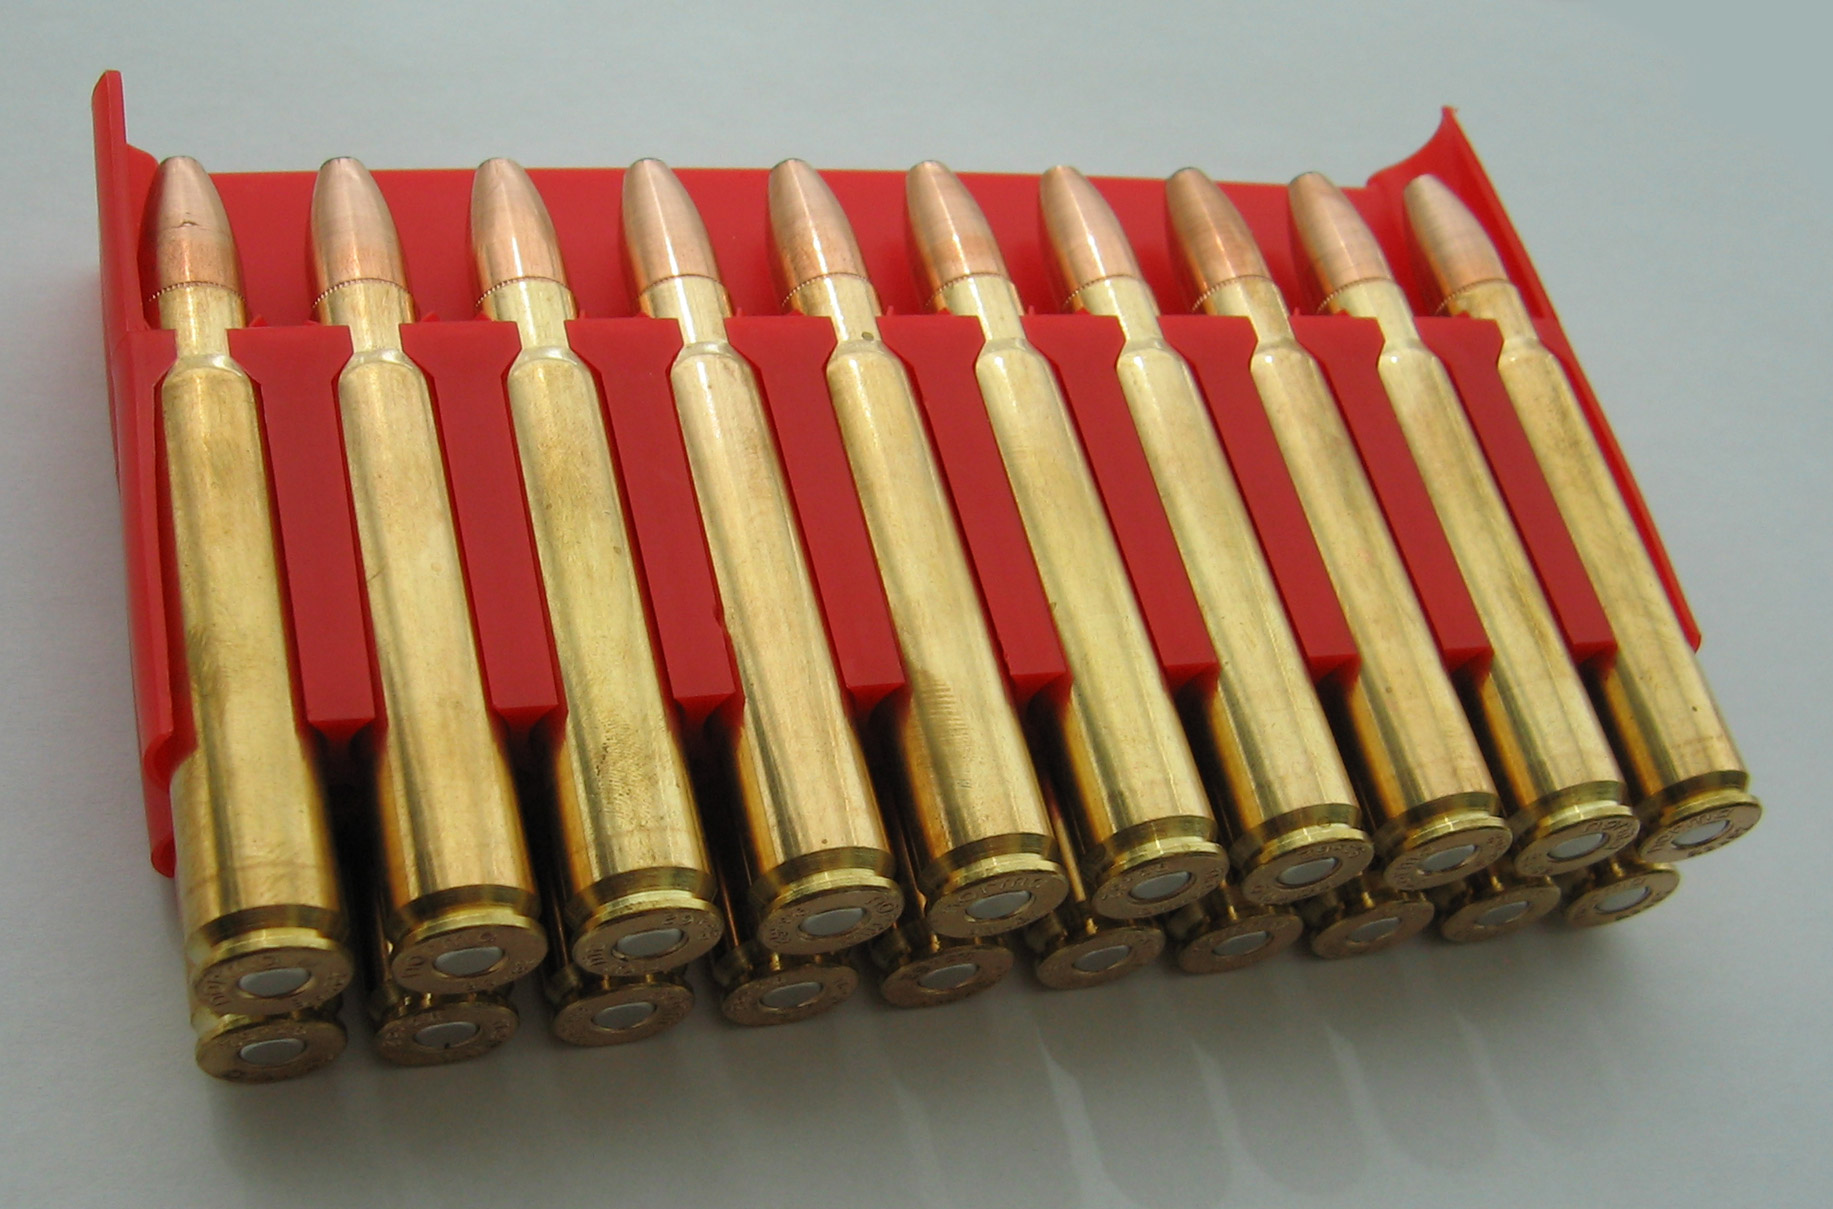 Norma 9.3x62 ammunition Oryx bullet